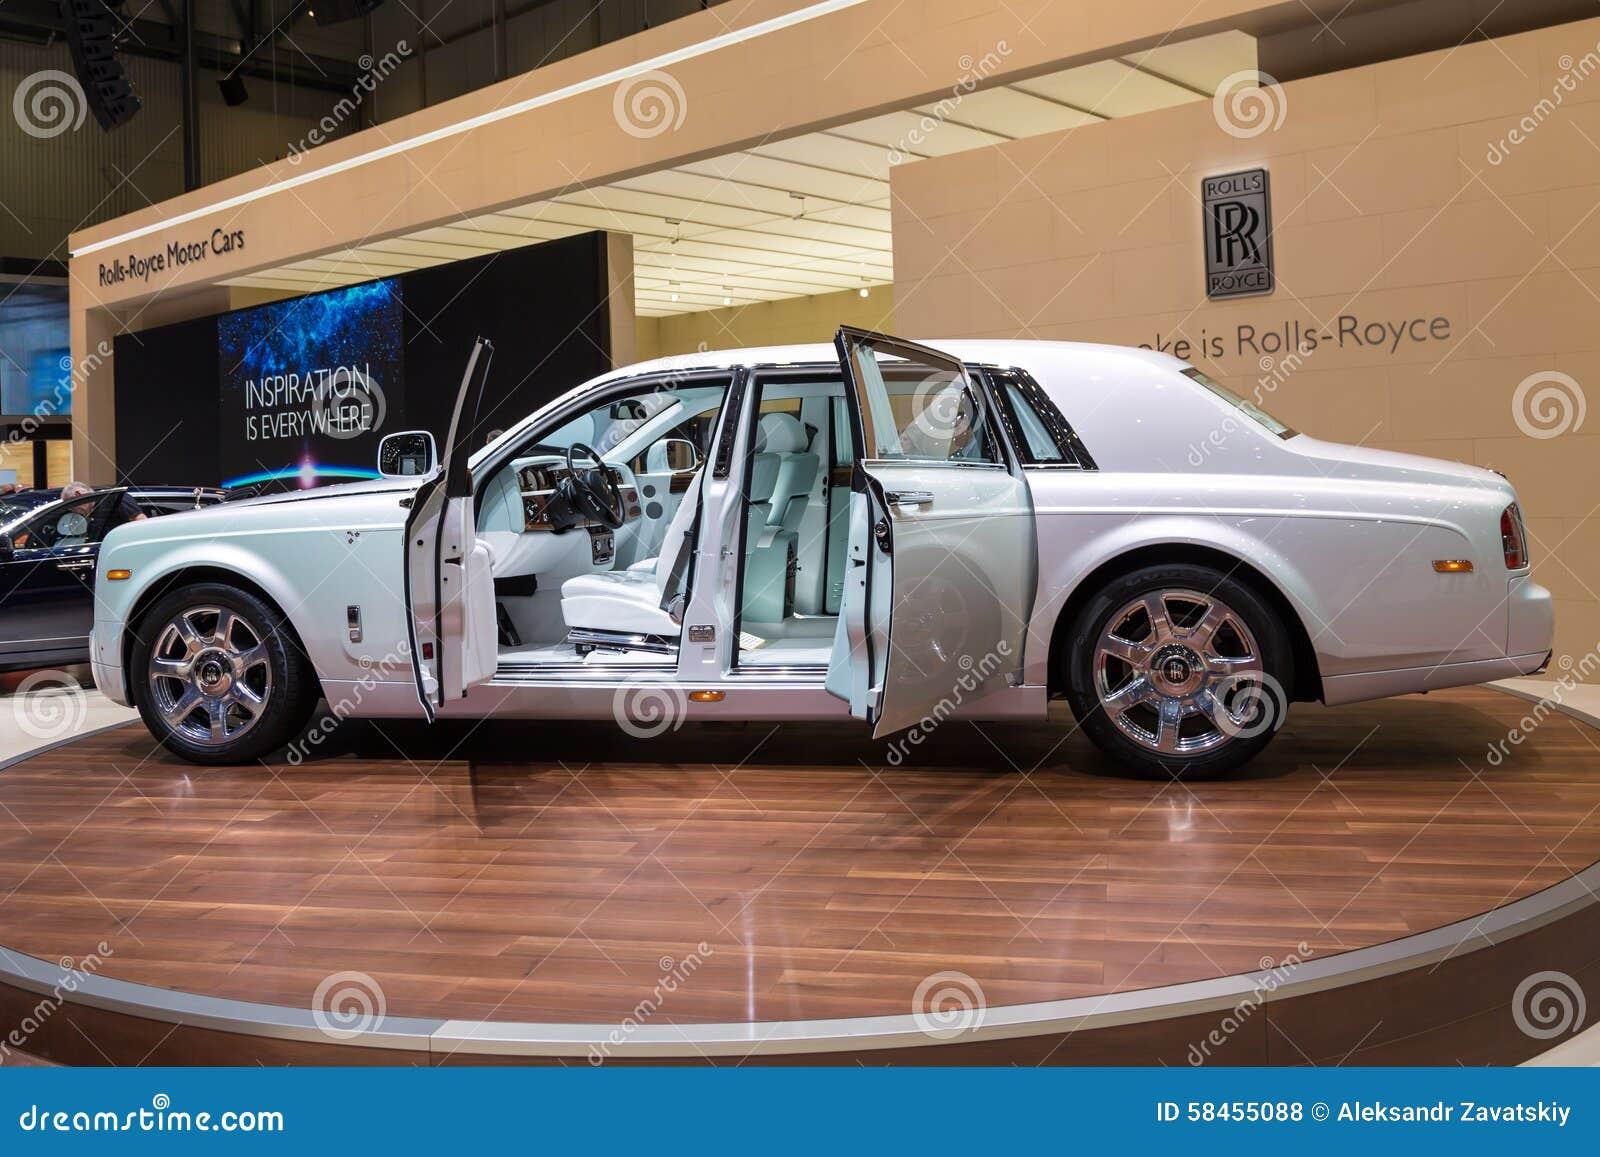 Rolls royce 2015 Phantom Serenity